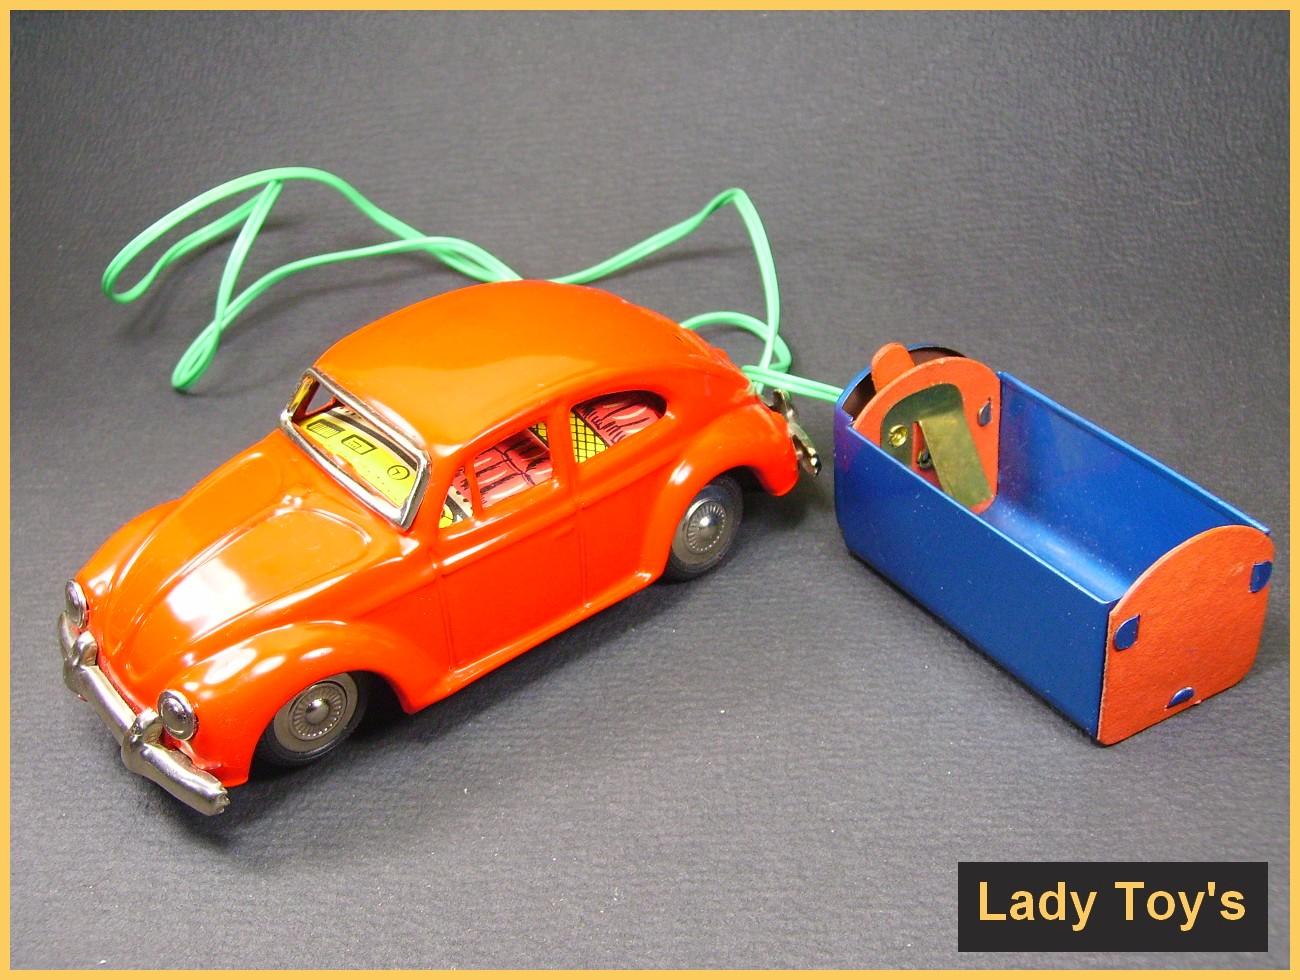 asahi battery operated volkswagen beetle vw japan. Black Bedroom Furniture Sets. Home Design Ideas